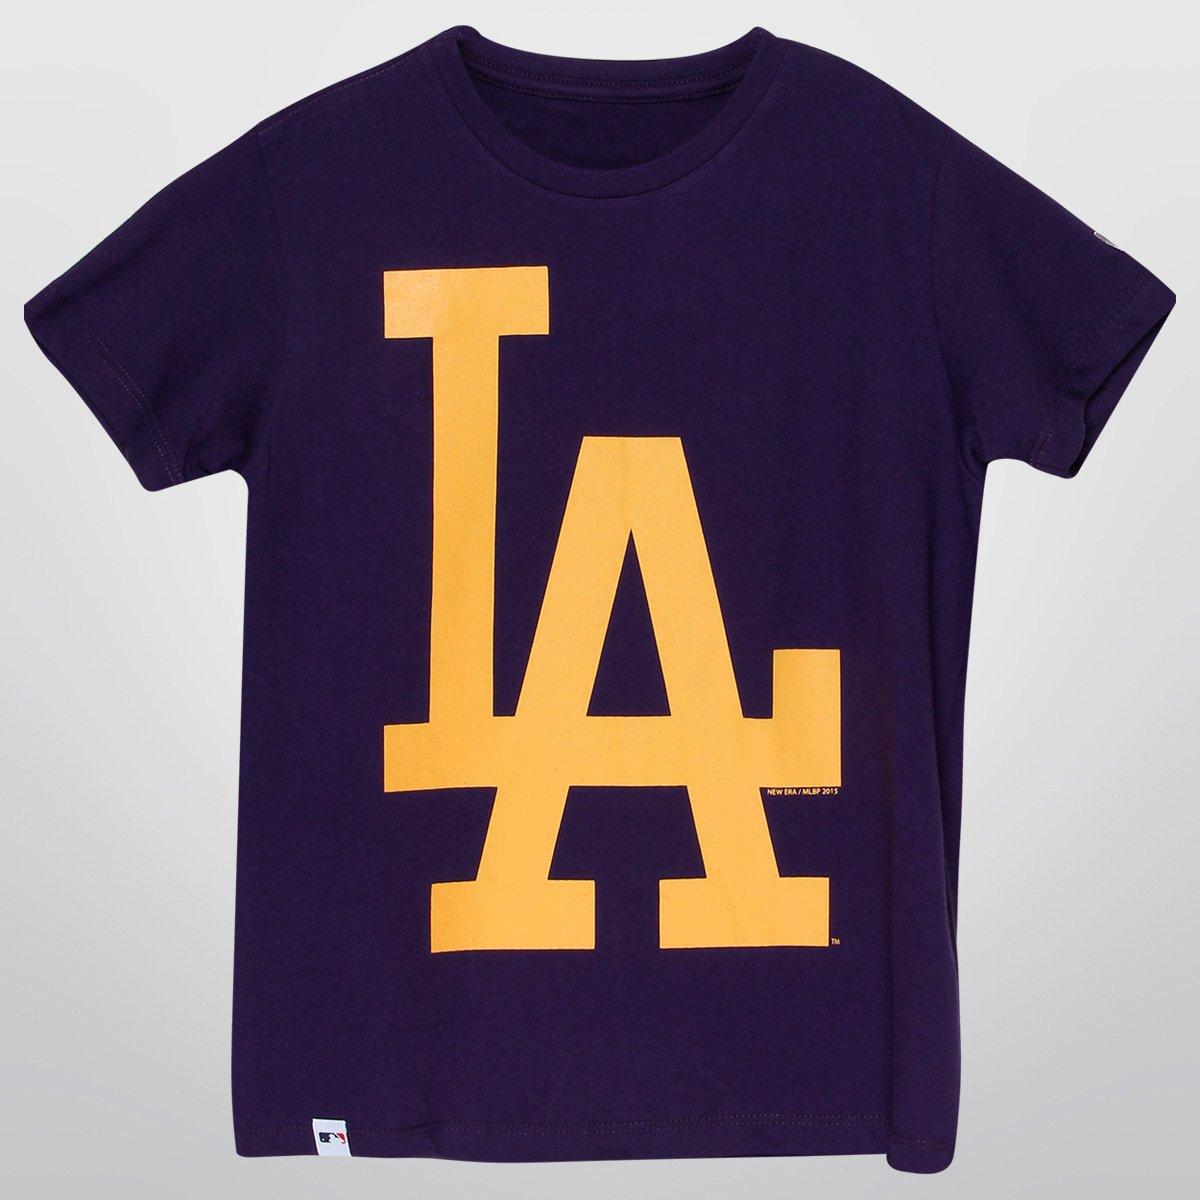 744448ab6605a Camiseta New Era MLB Los Angeles Dodgers Infantil - Compre Agora ...